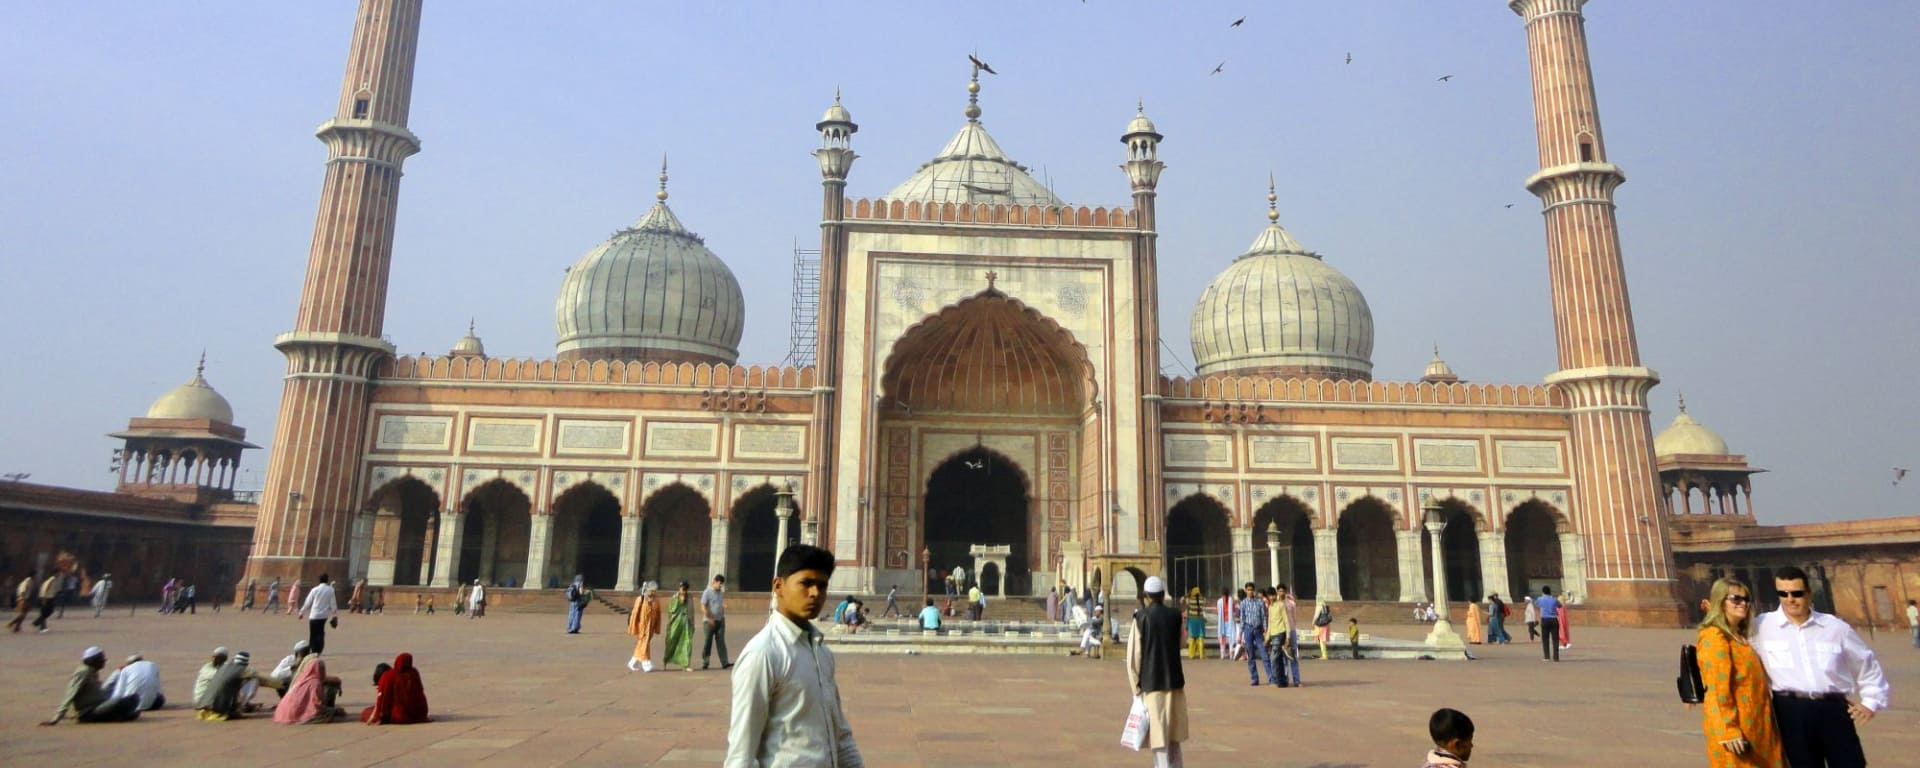 Old Delhi: Delhi: Jama Masjid